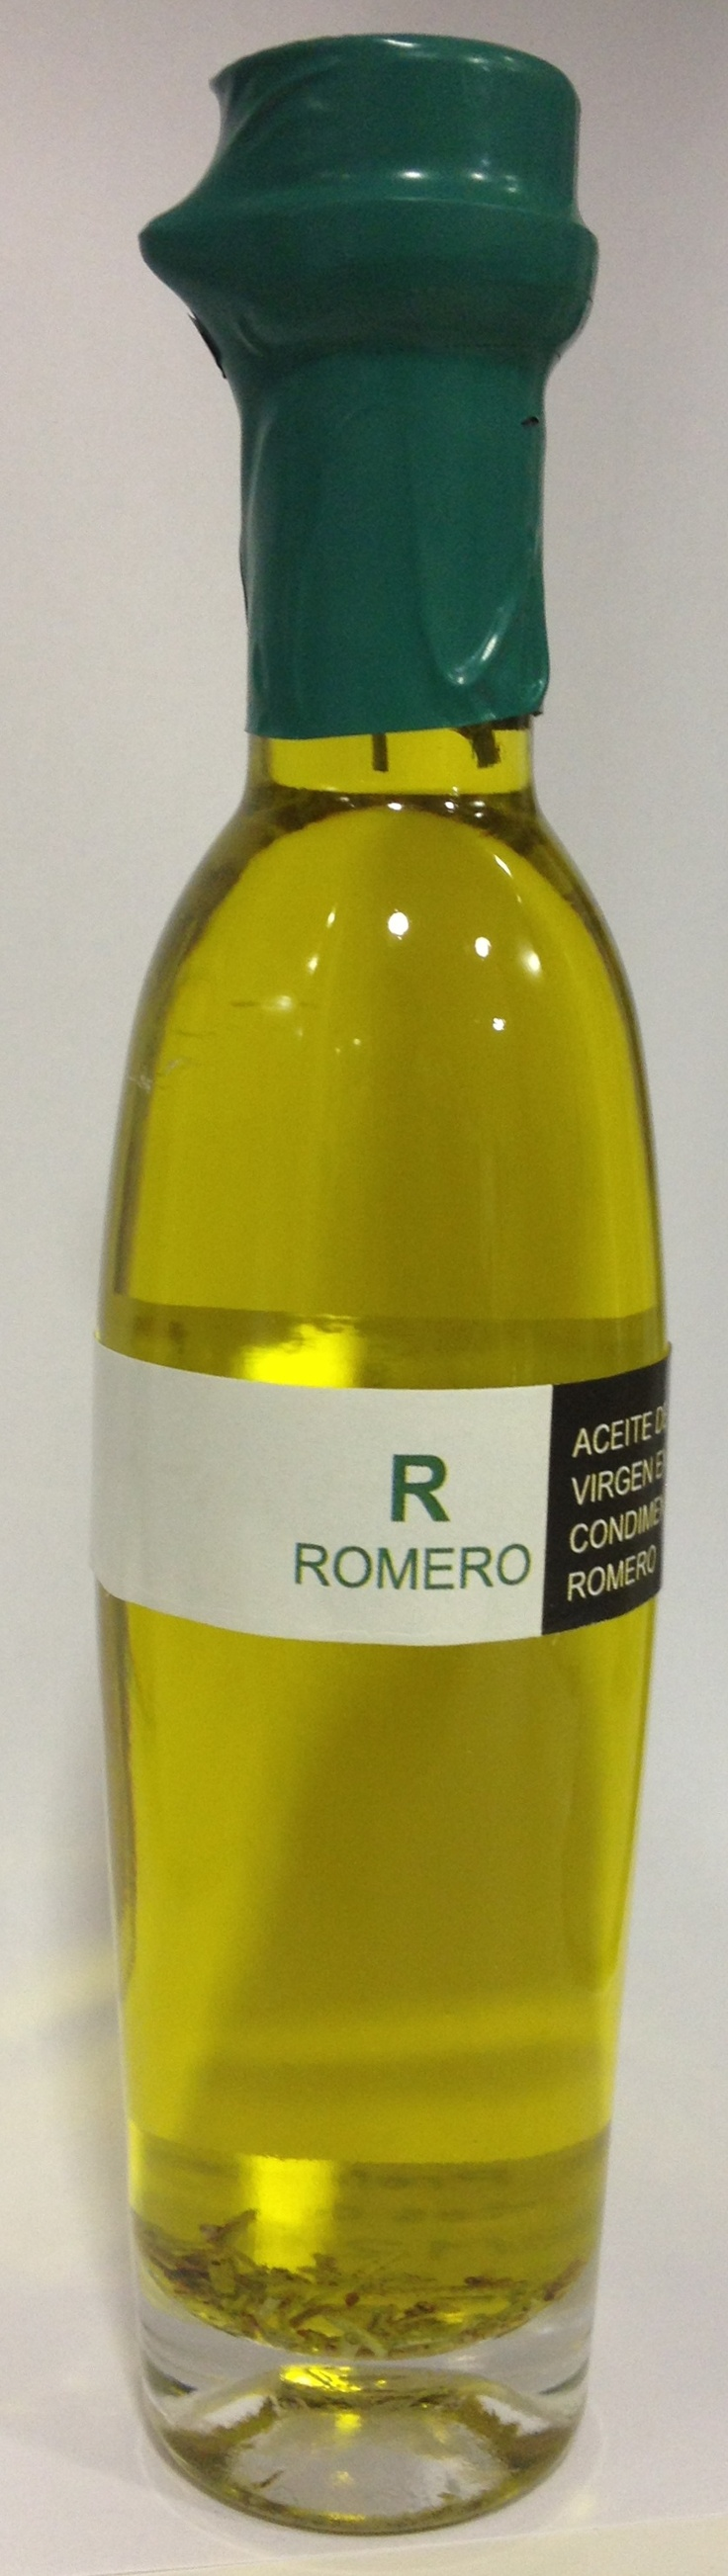 Aceite de oliva virgen extra ecostean con romero!